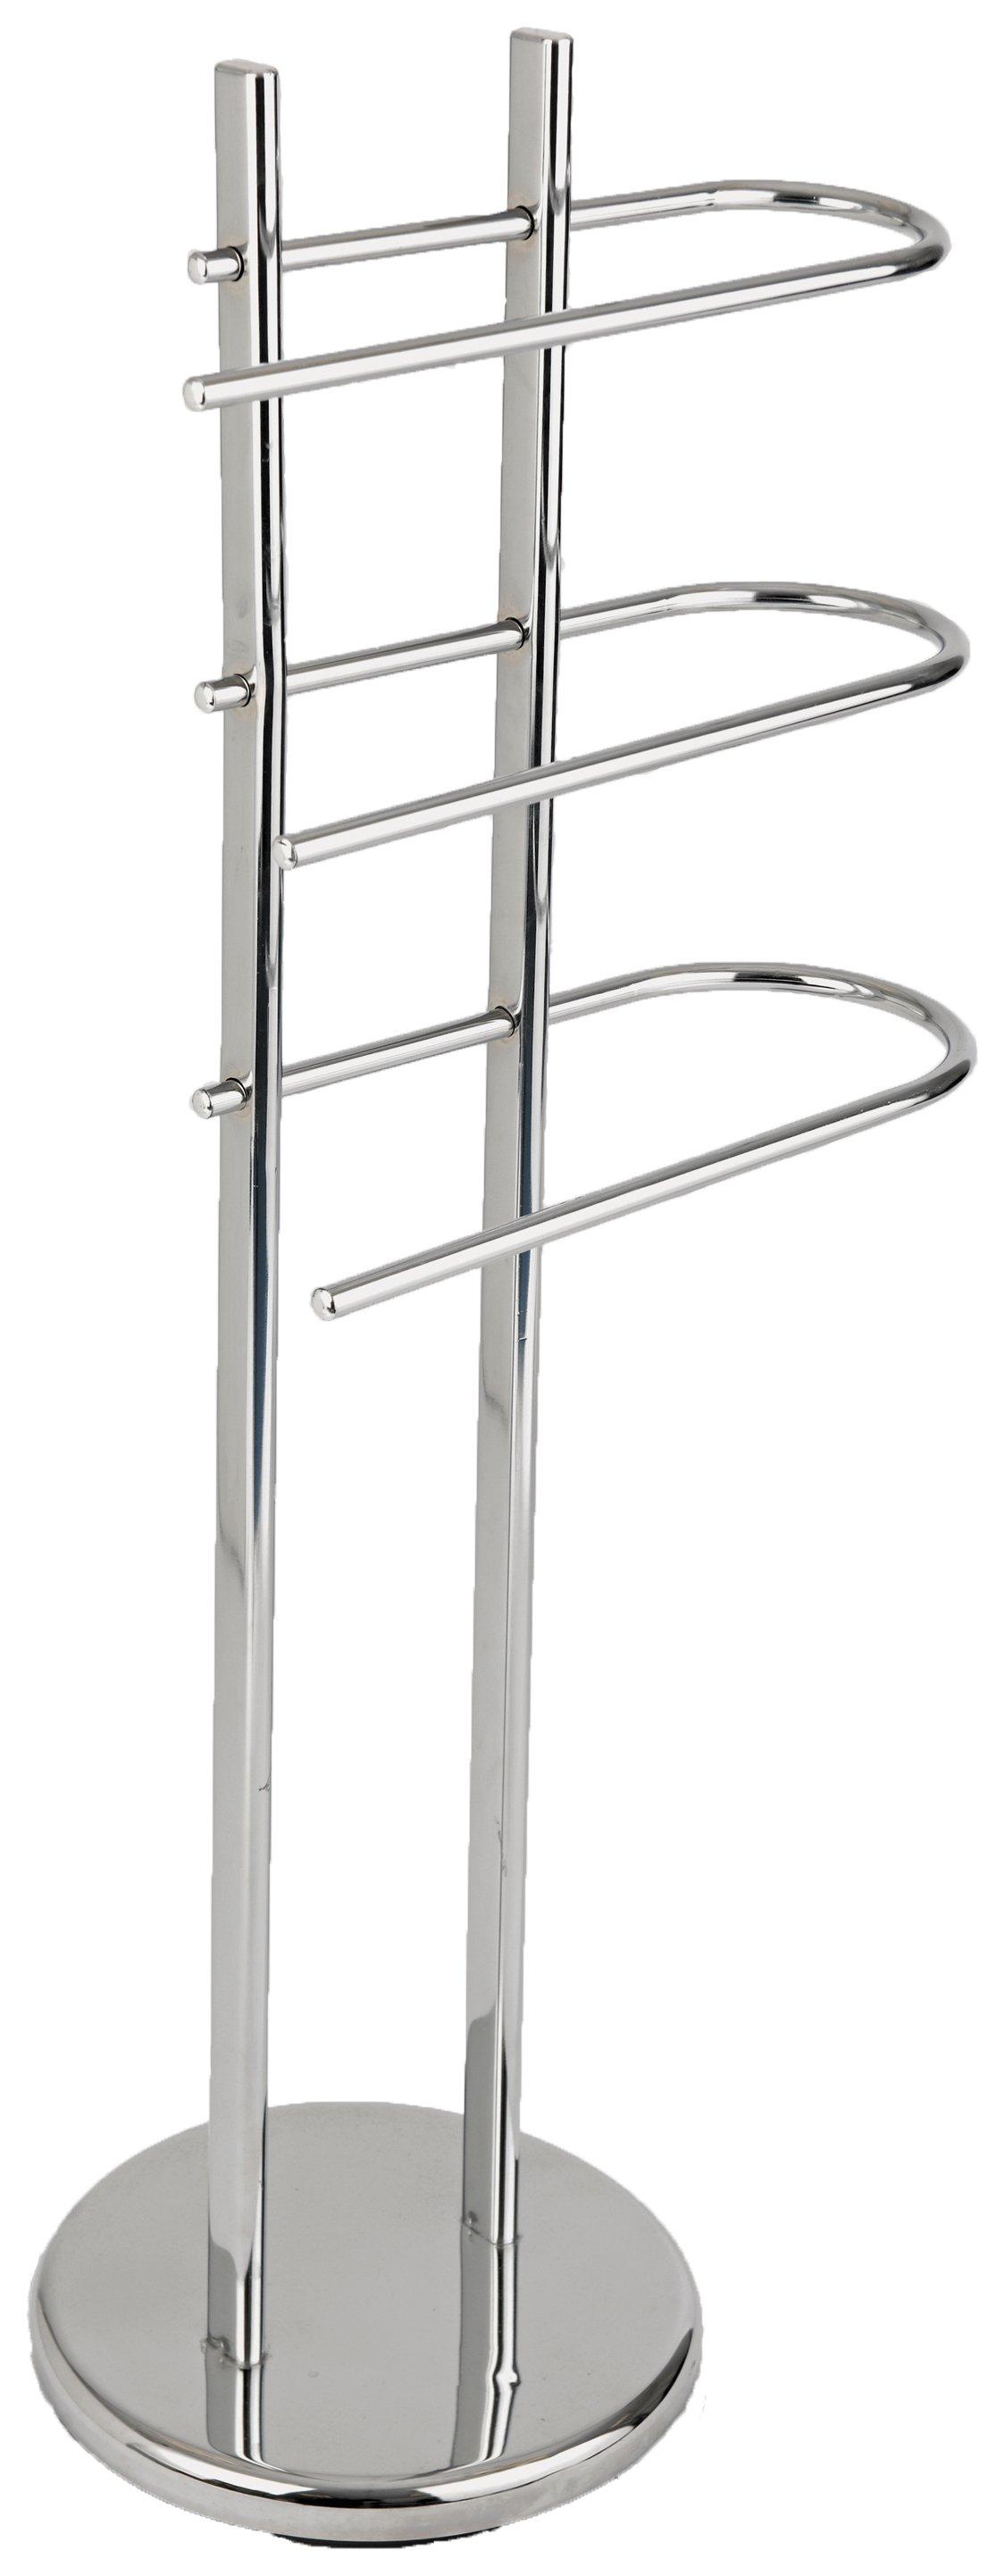 HOME - Freestanding - Towel Rail - Chrome